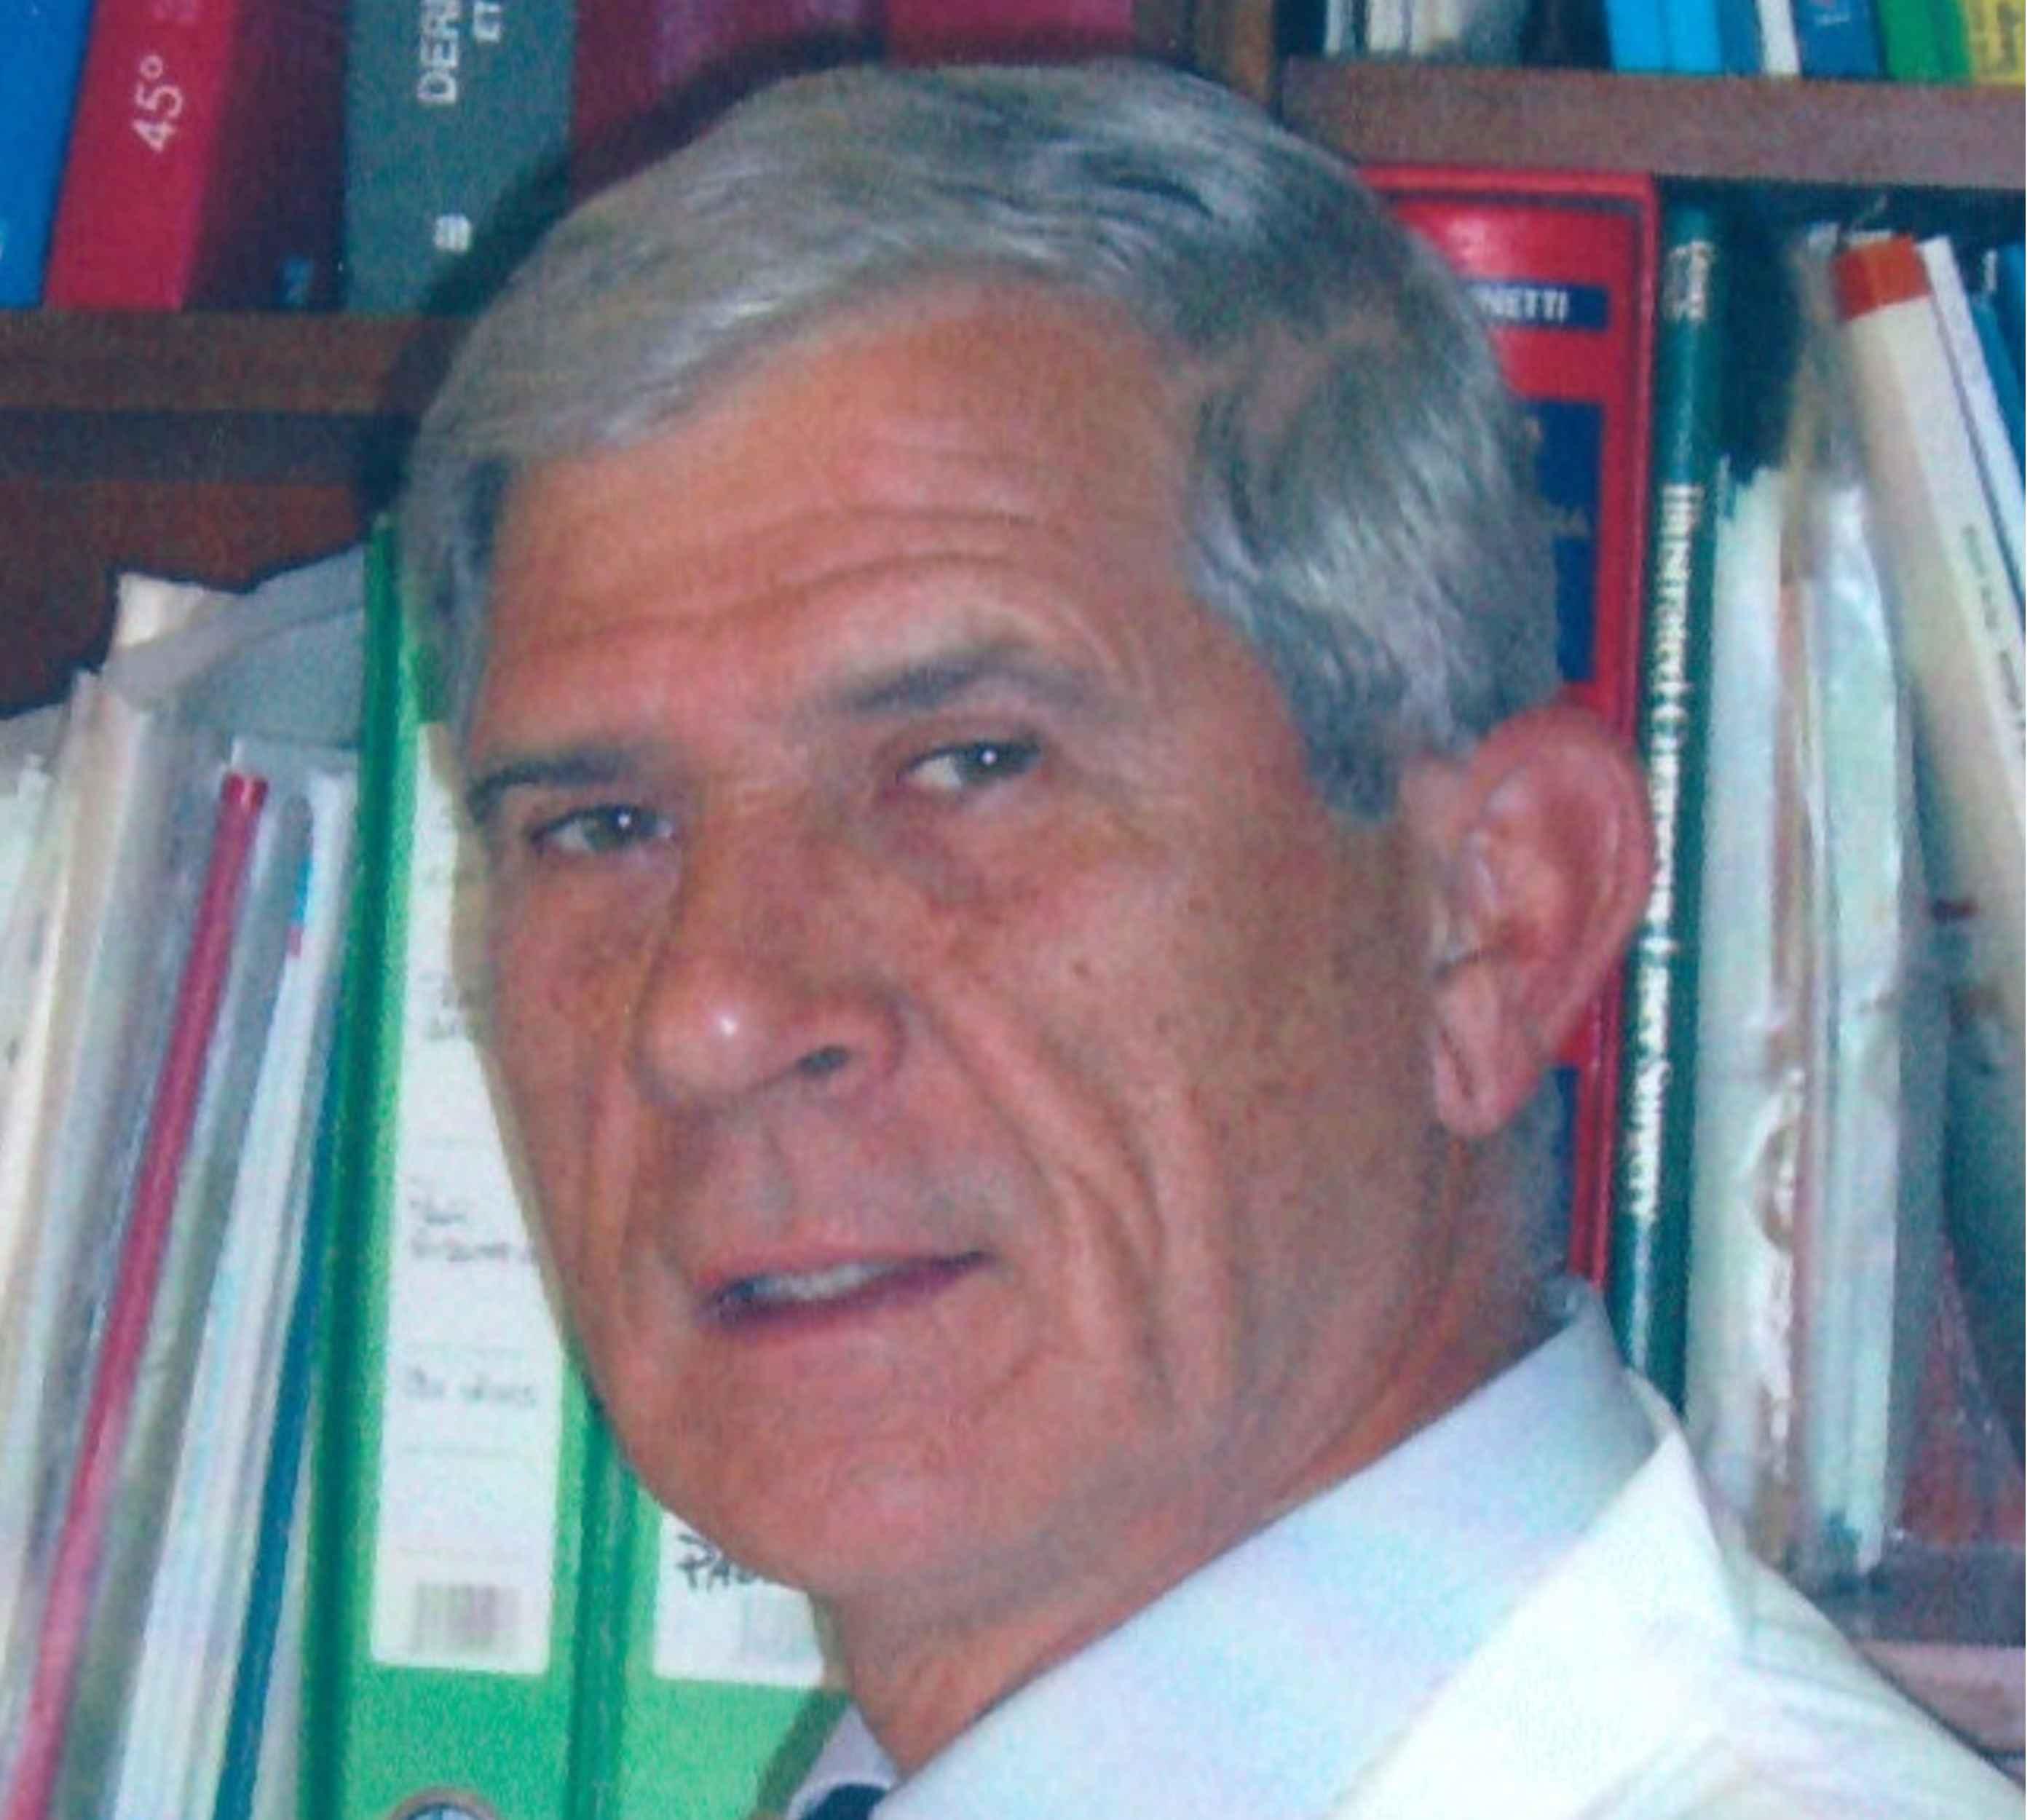 Dott. Paolo Piazza